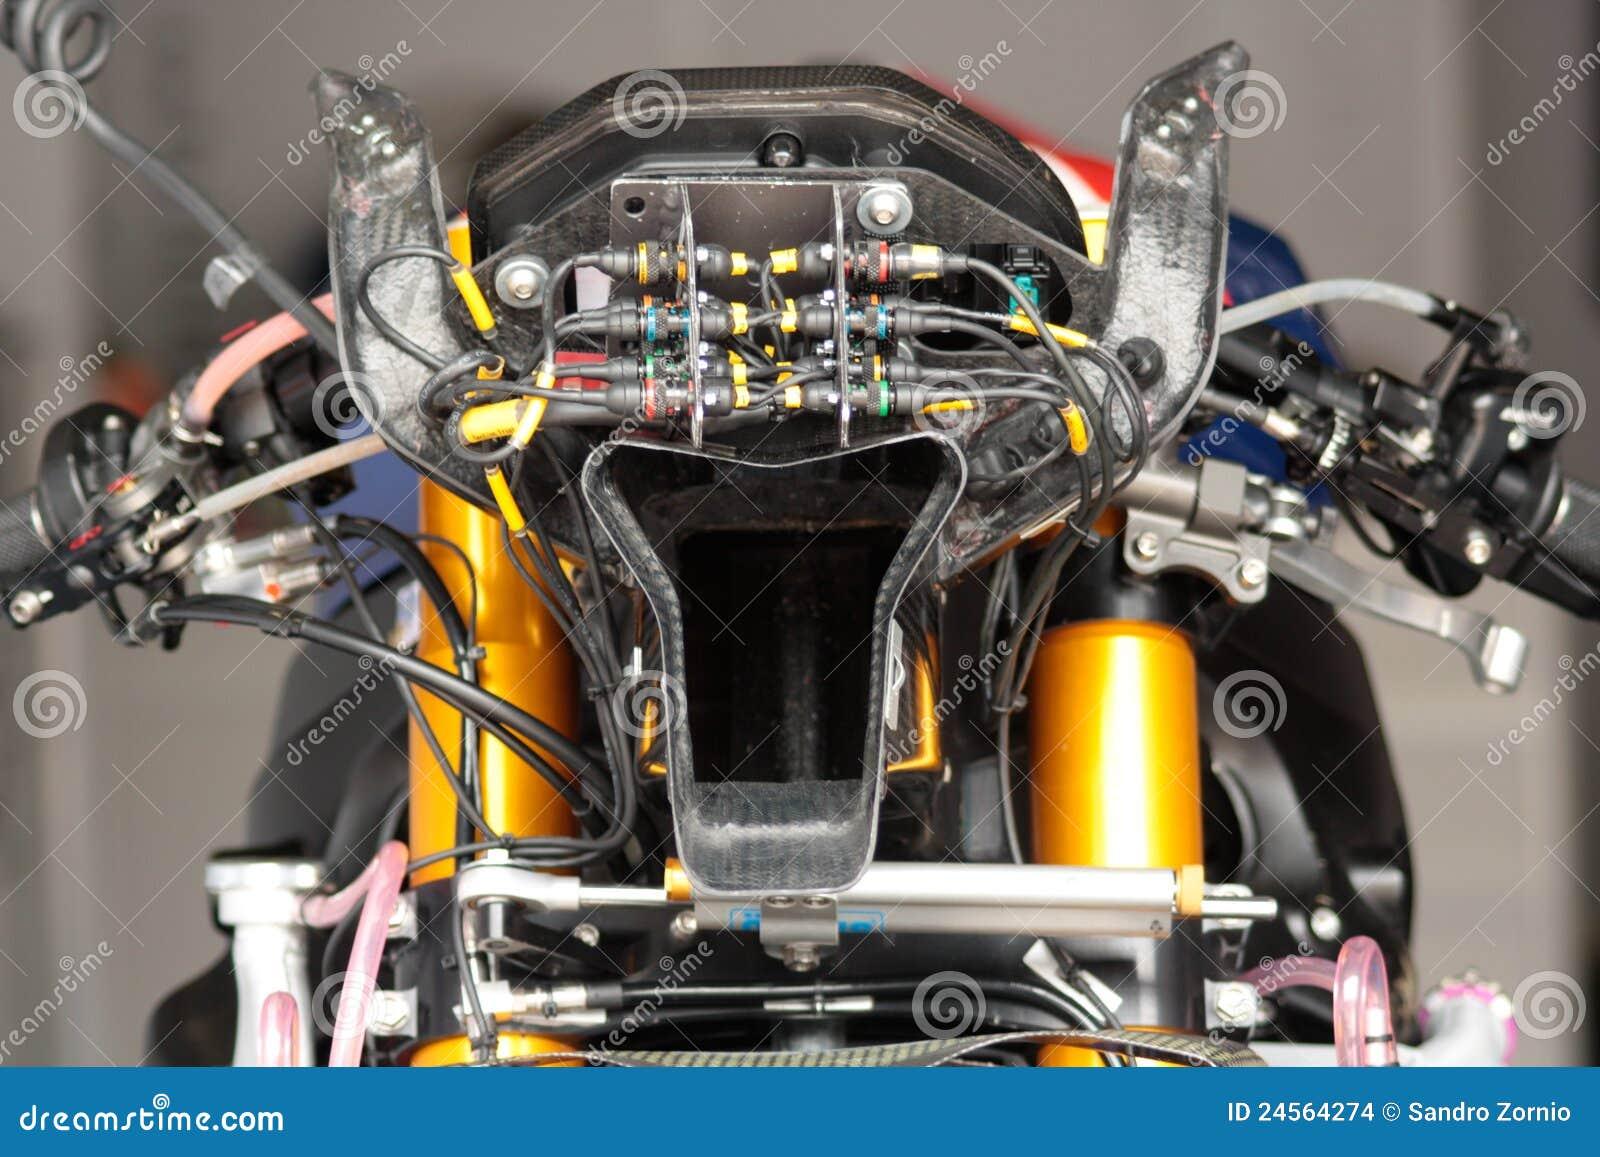 BMW S1000RR BMW Motorrad Motorsport